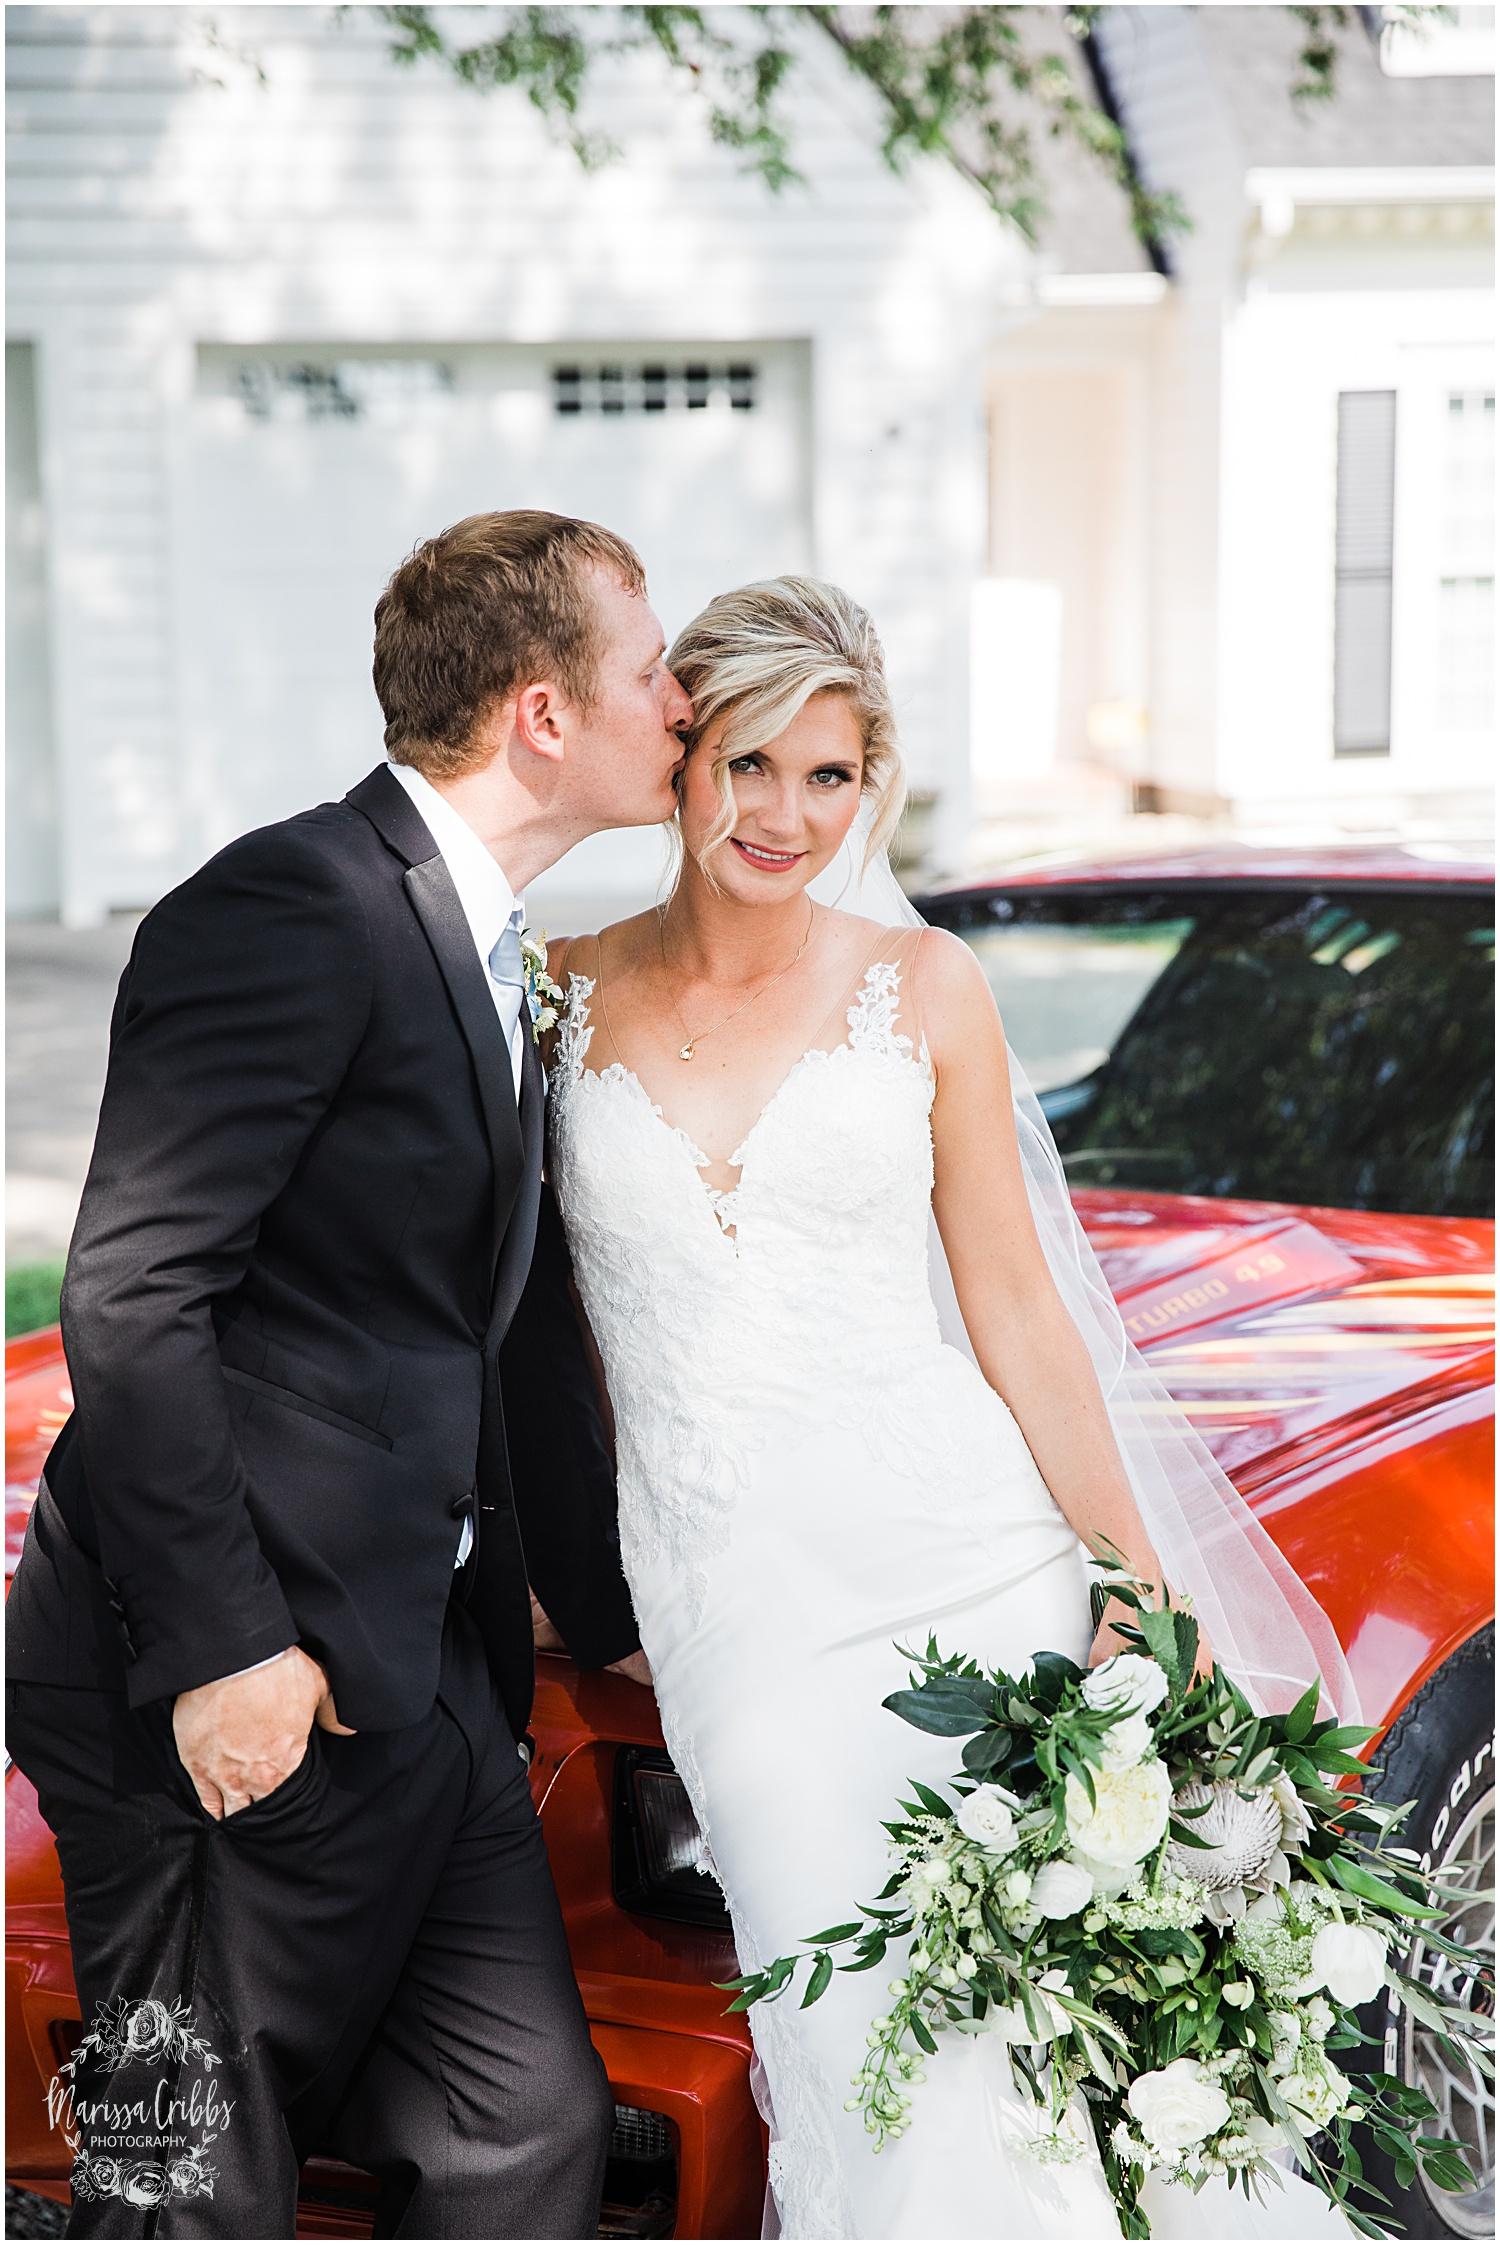 CHELSEA & BEN MARRIED BLOG  | MARISSA CRIBBS PHOTOGRAPHY_8583.jpg